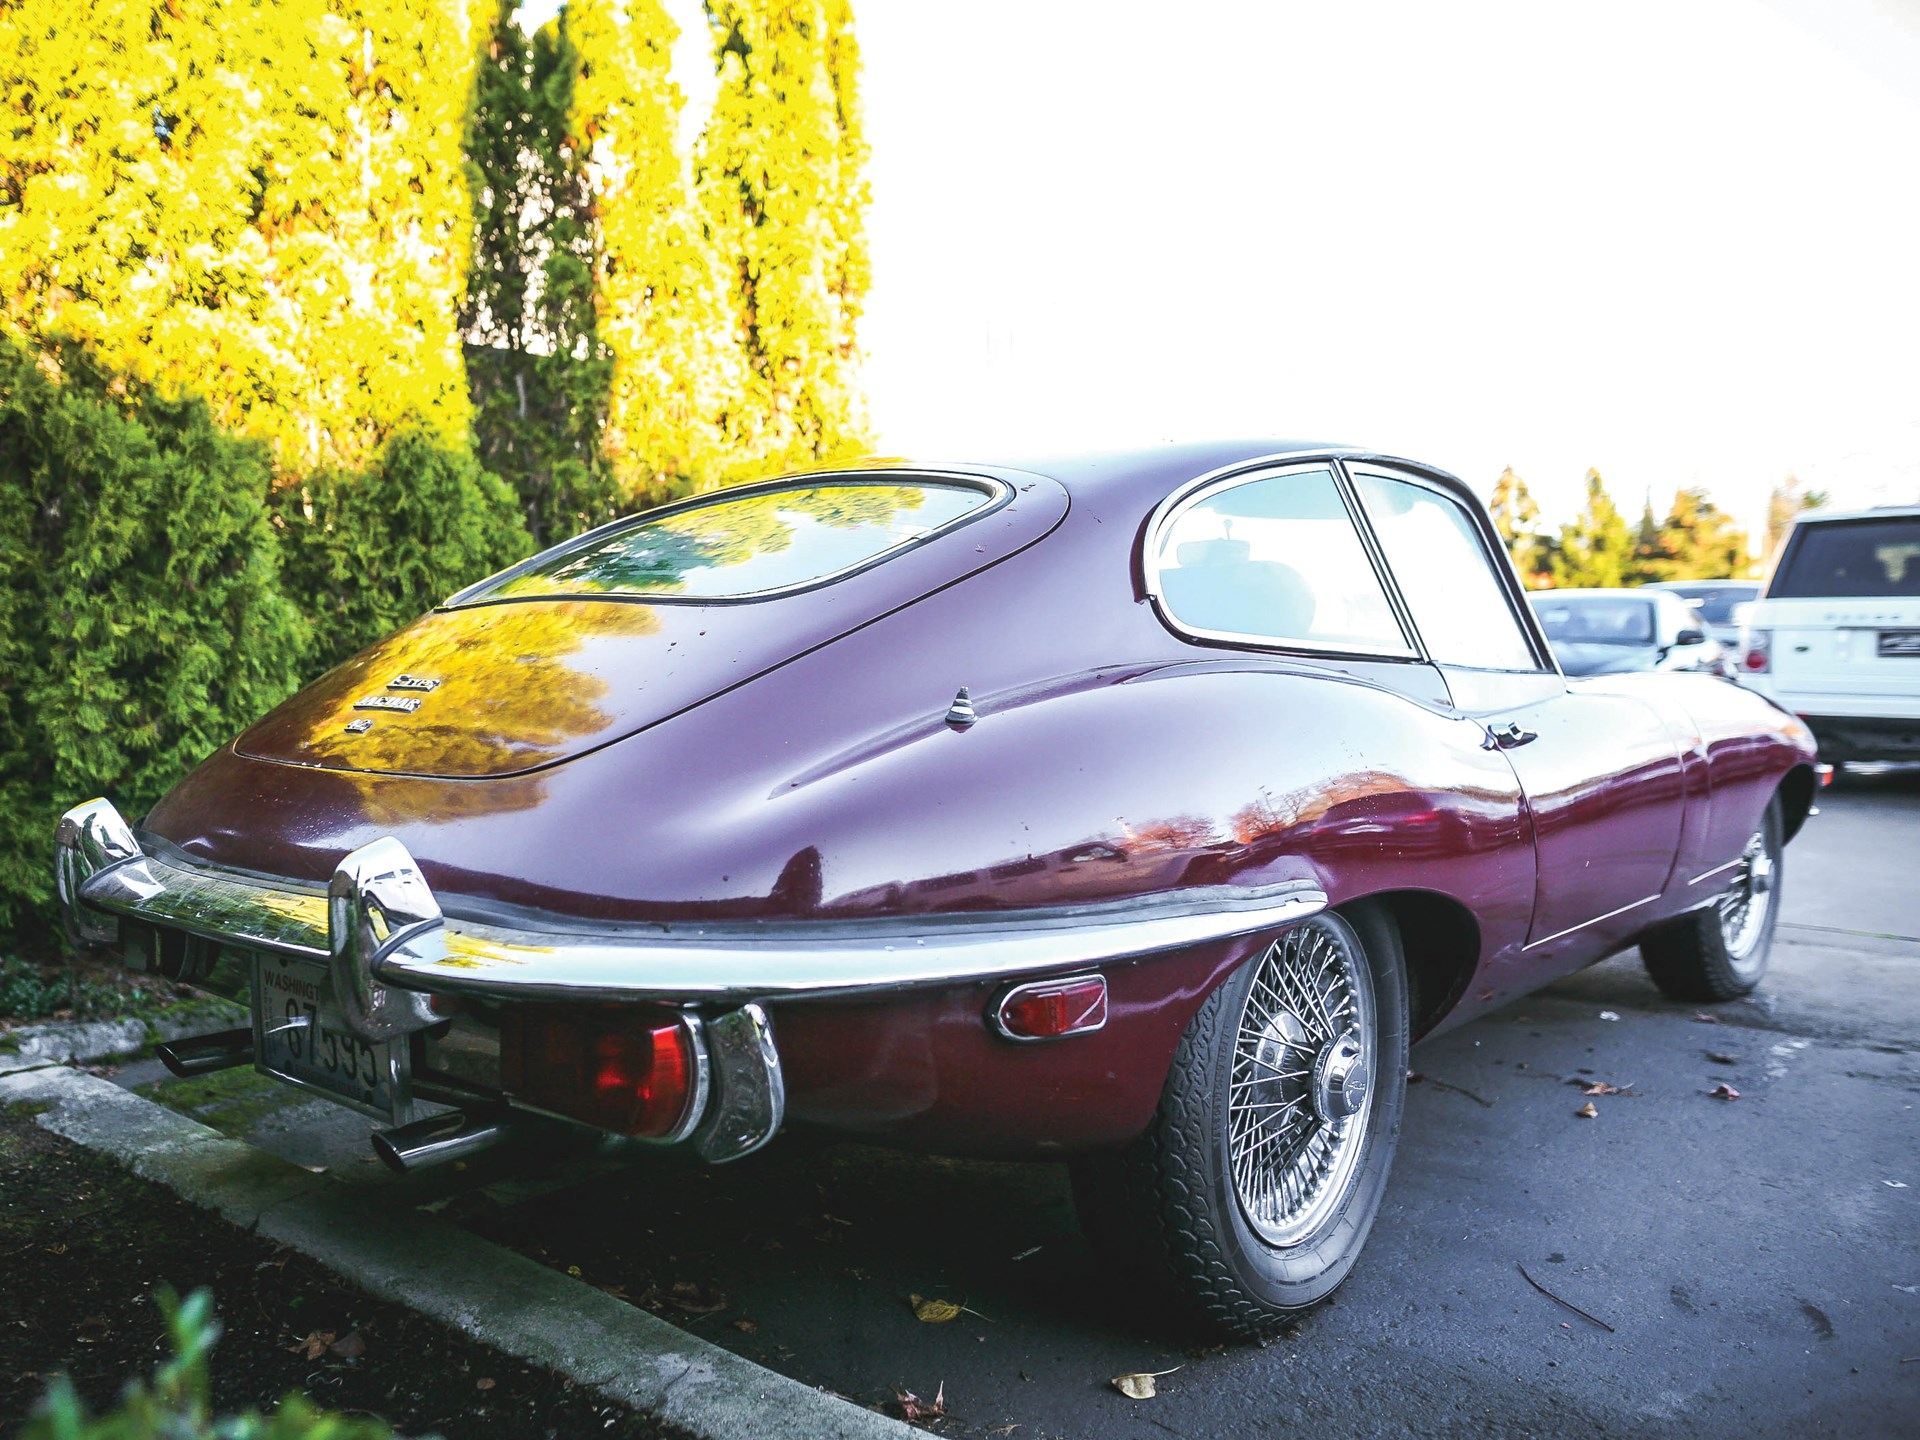 1970 Jaguar E-Type Series 2 4.2-Litre Fixed Head Coupe